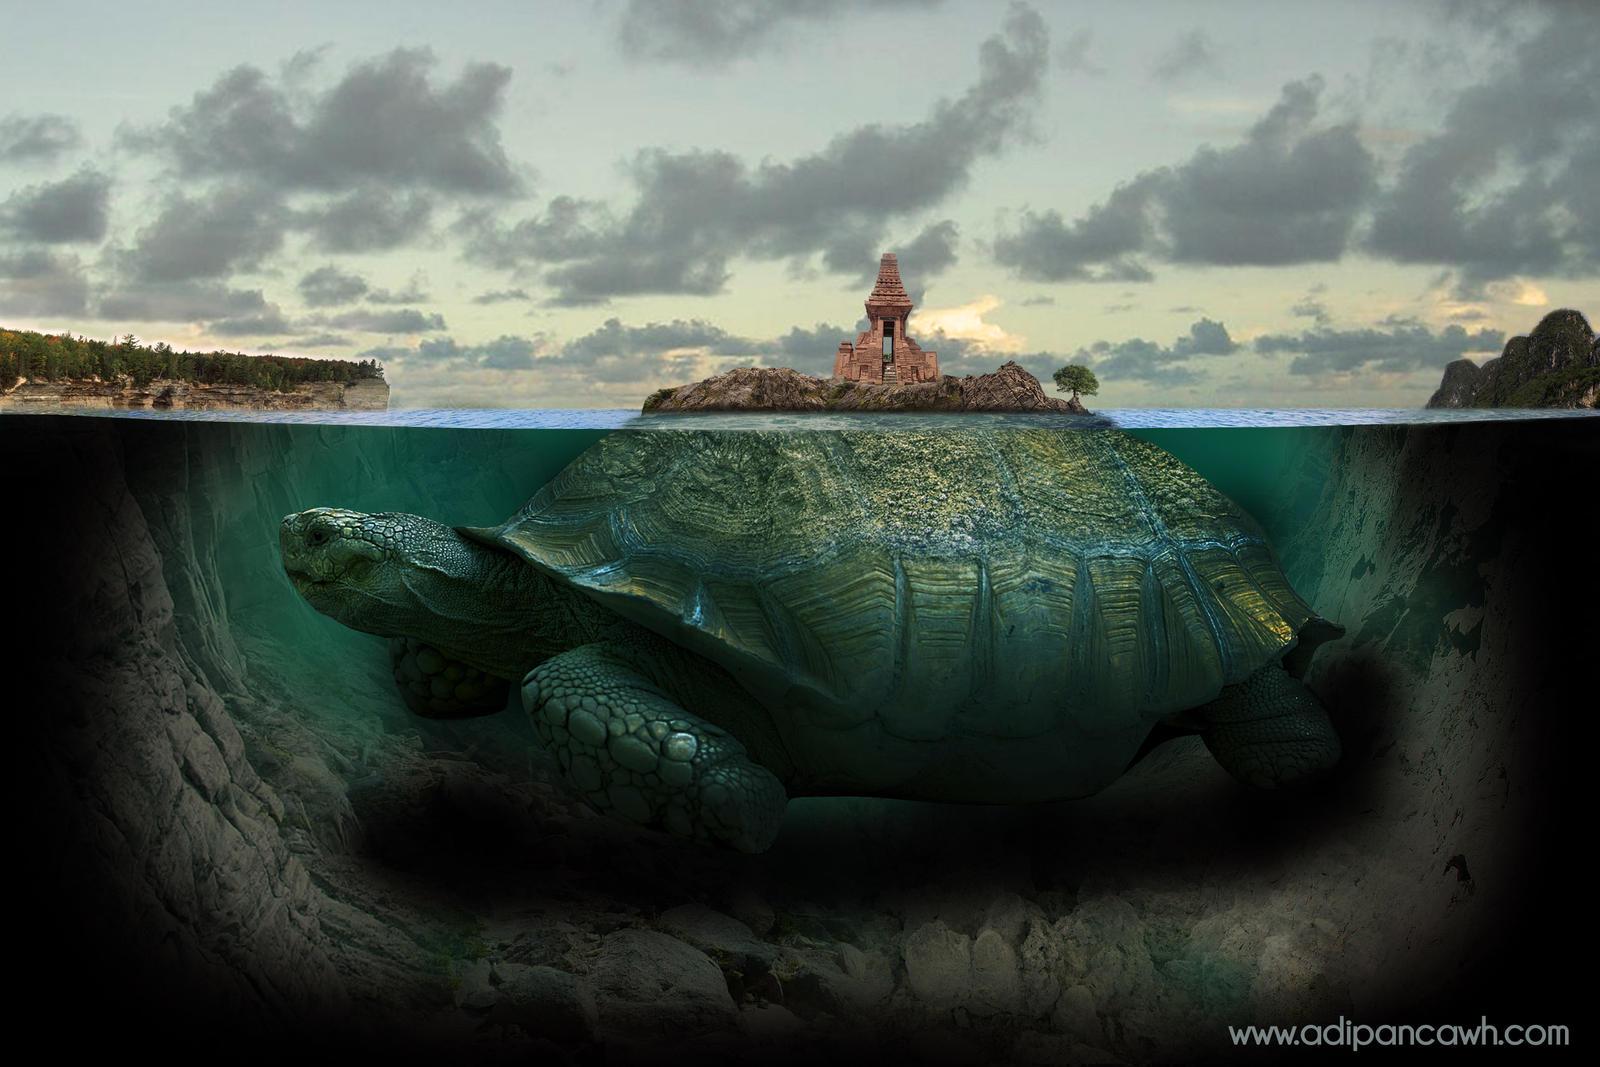 Turtles Island / Bajang Ratu Temples by Adipancawh